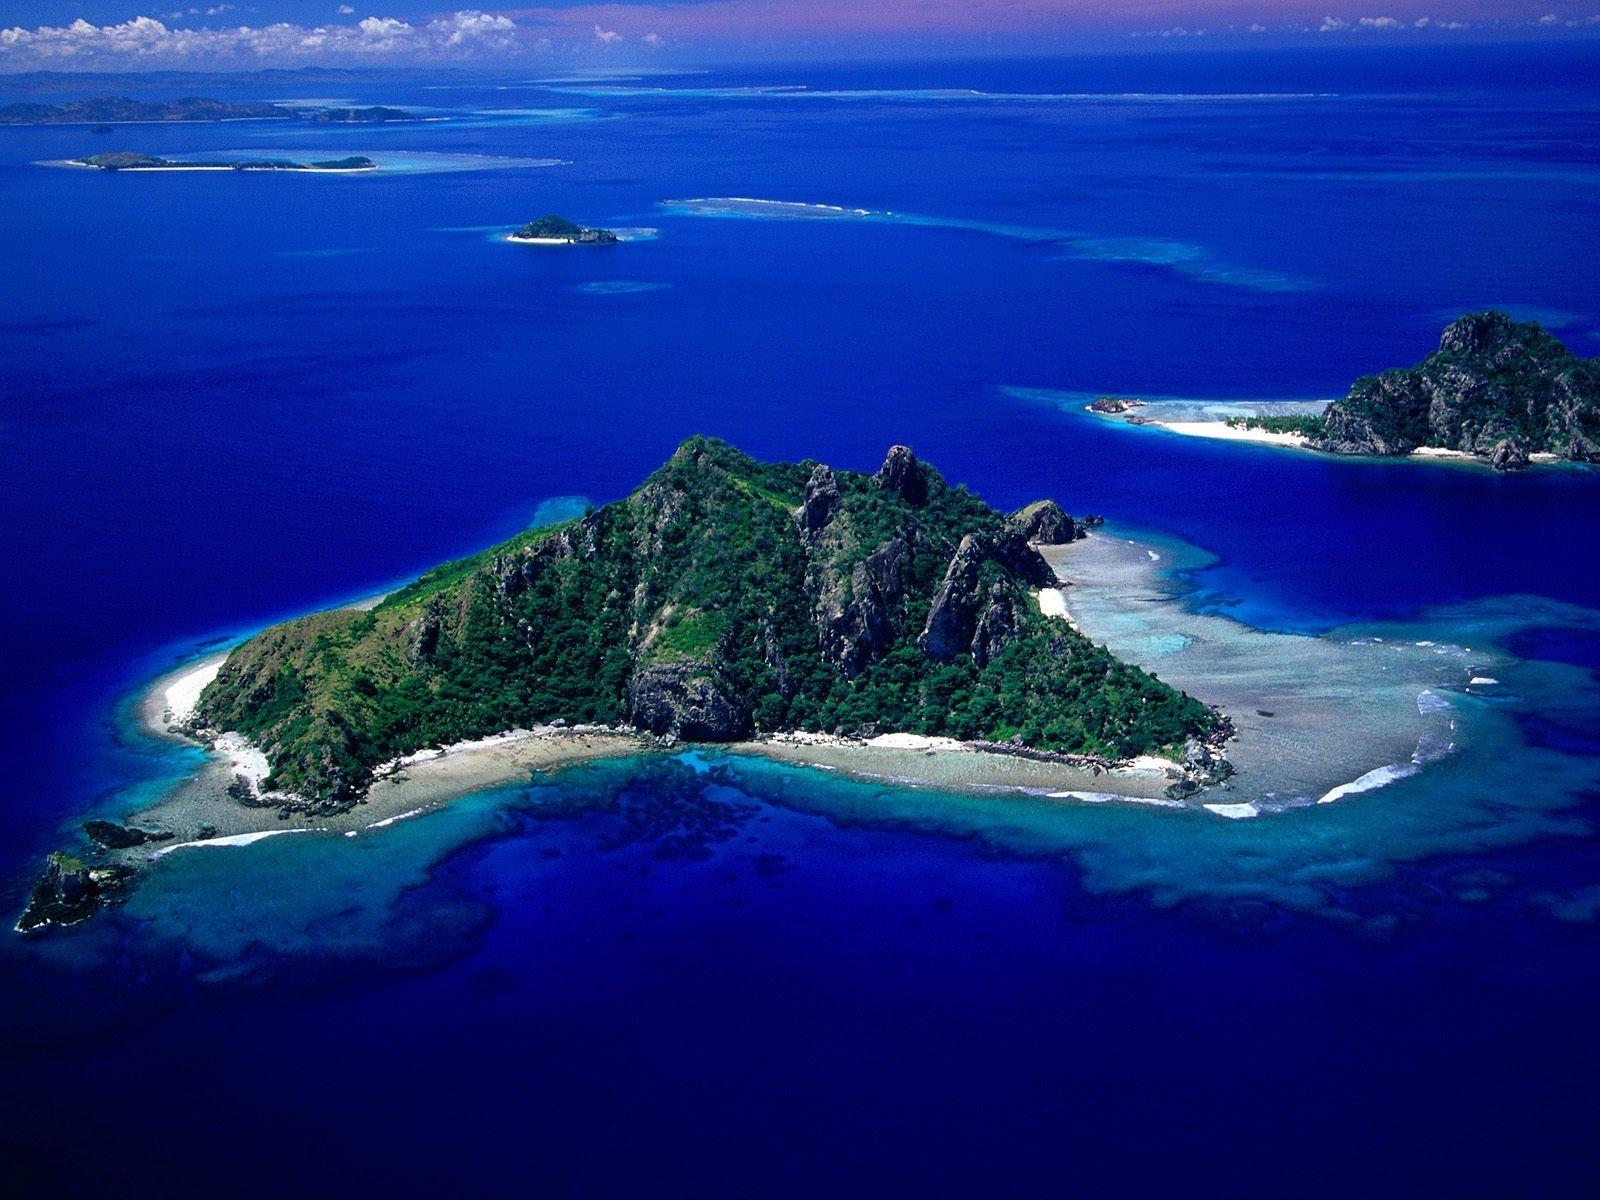 Top Wallpaper Name Vishal - aerial_view_of_monu_island_wallpaper_fiji_islands_world_1948  Pictures_45618.jpg